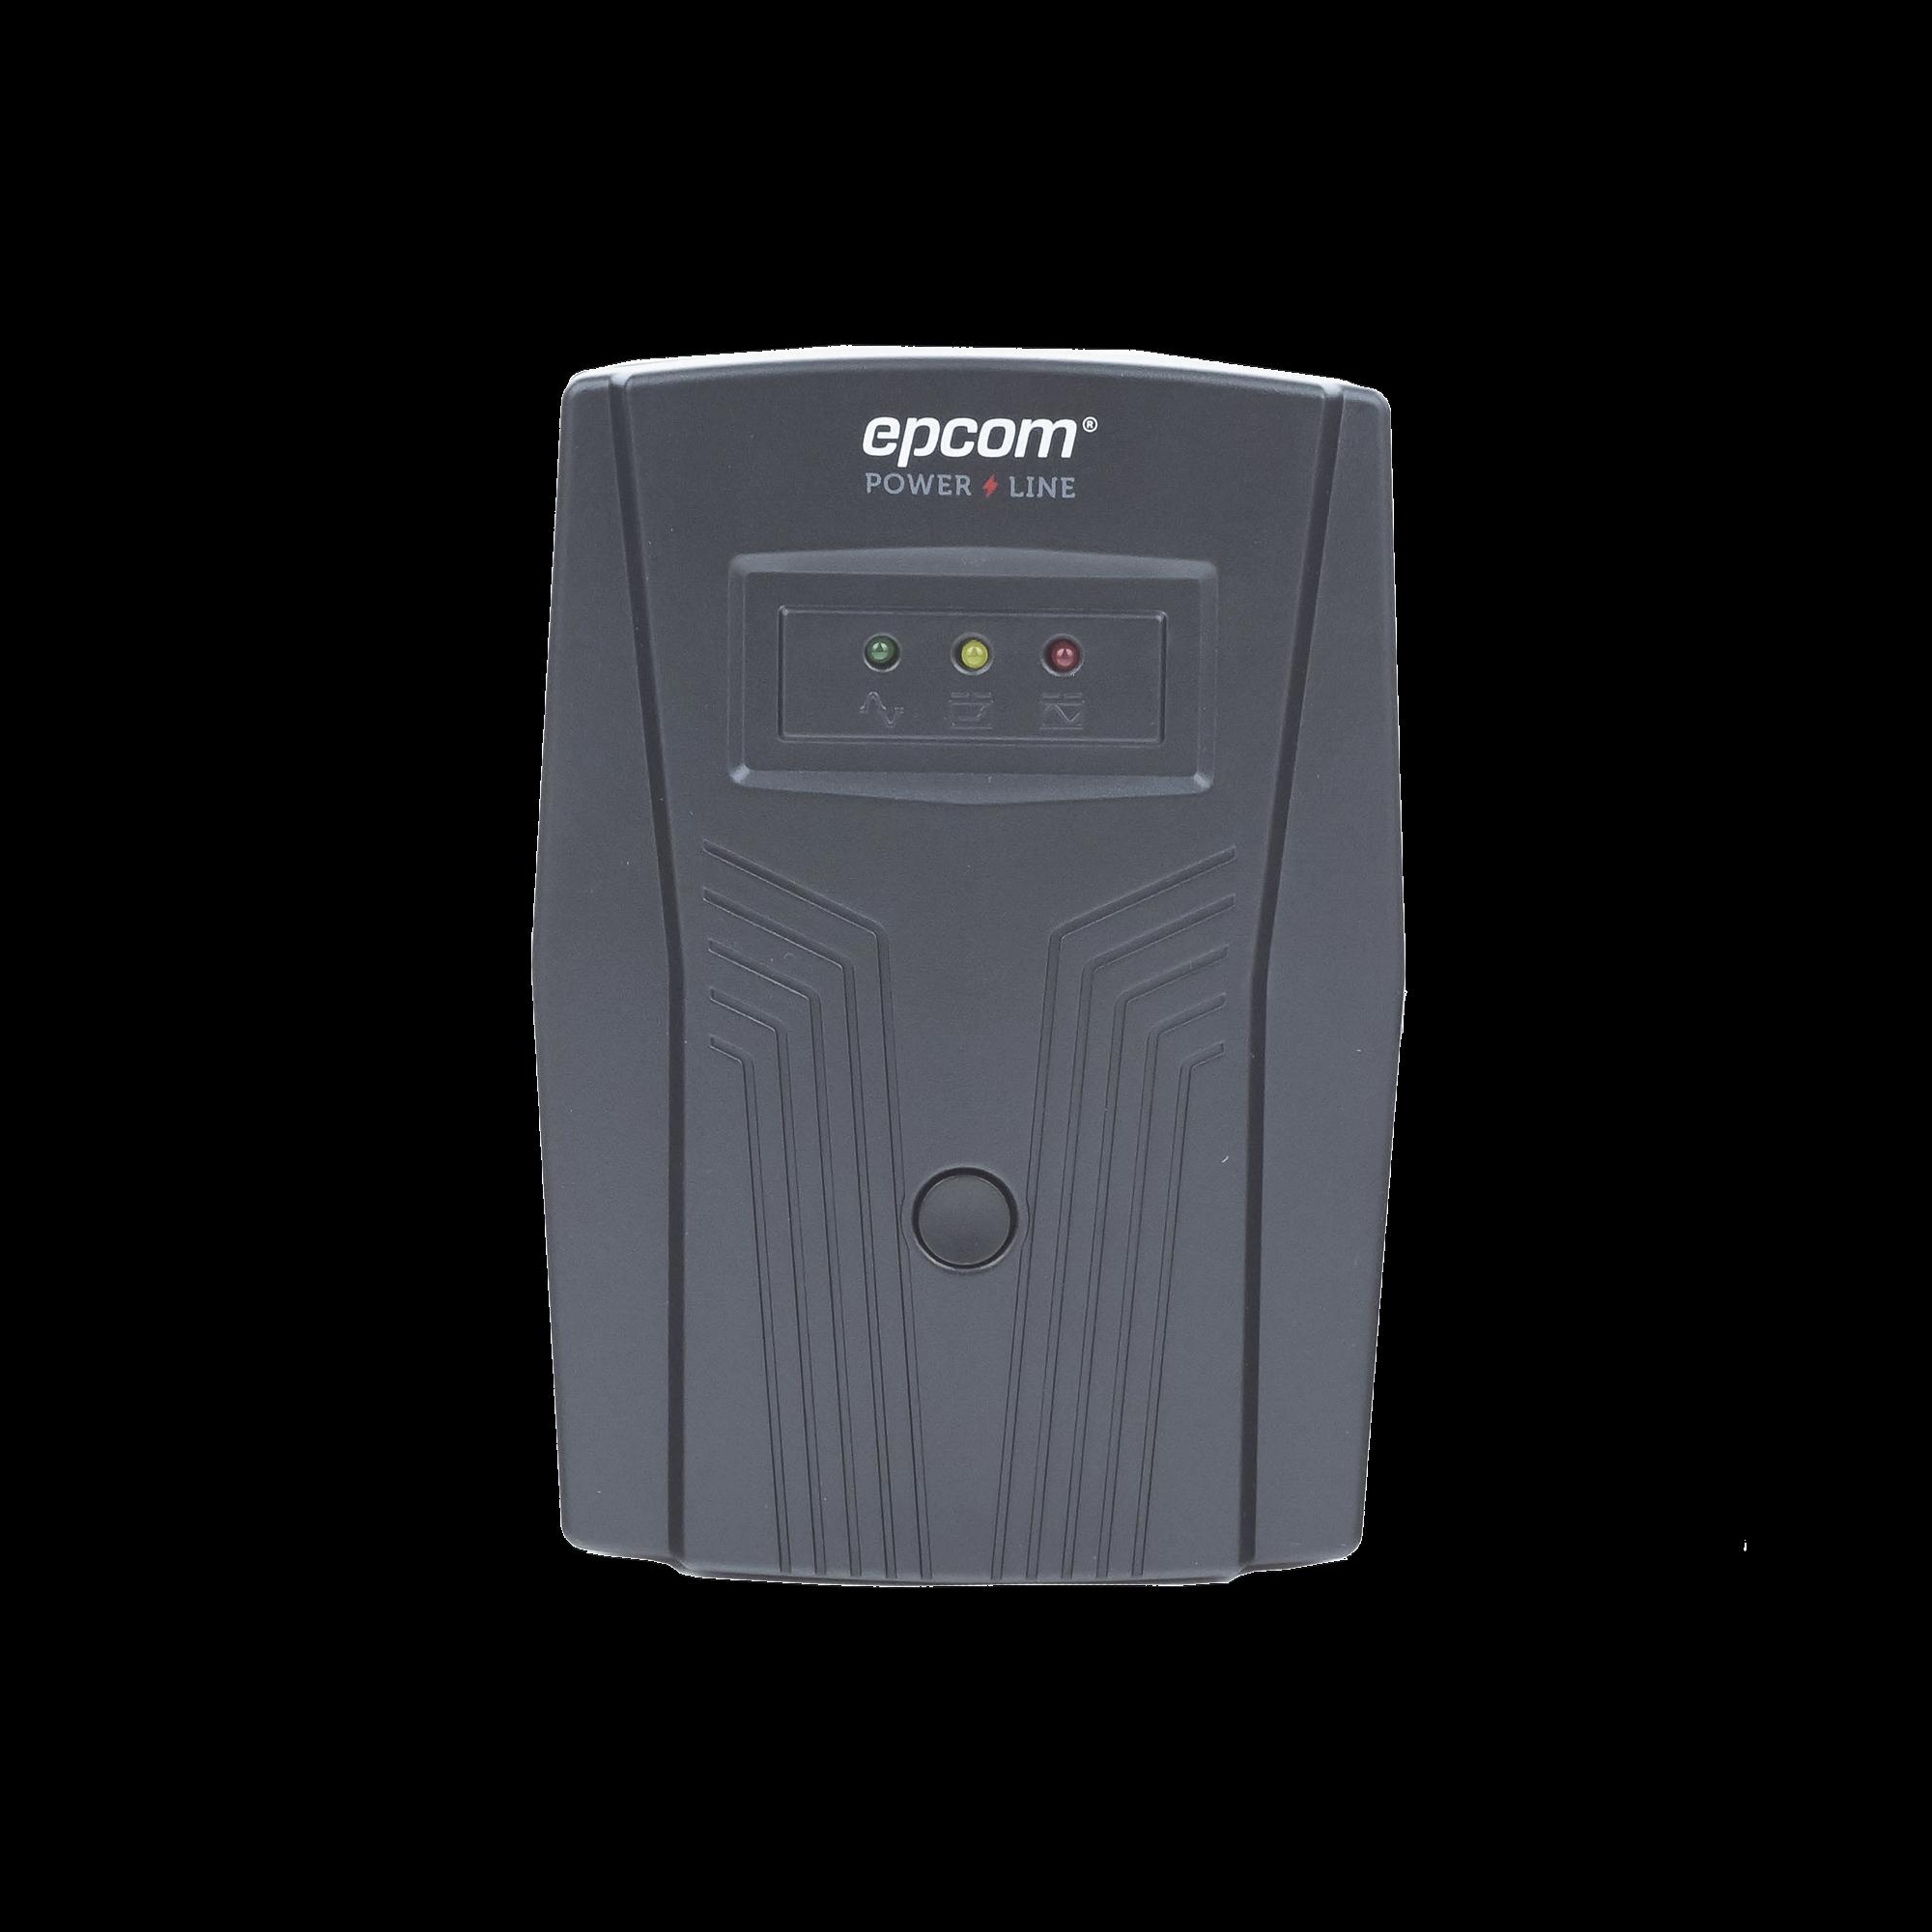 UPS de 850VA/510W / Topología Línea Interactiva / Entrada y Salida 120 Vca / Regulador de Voltaje AVR 80-150 Vca / Clavija NEMA 5-15P / 4 Tomas NEMA 5-15R